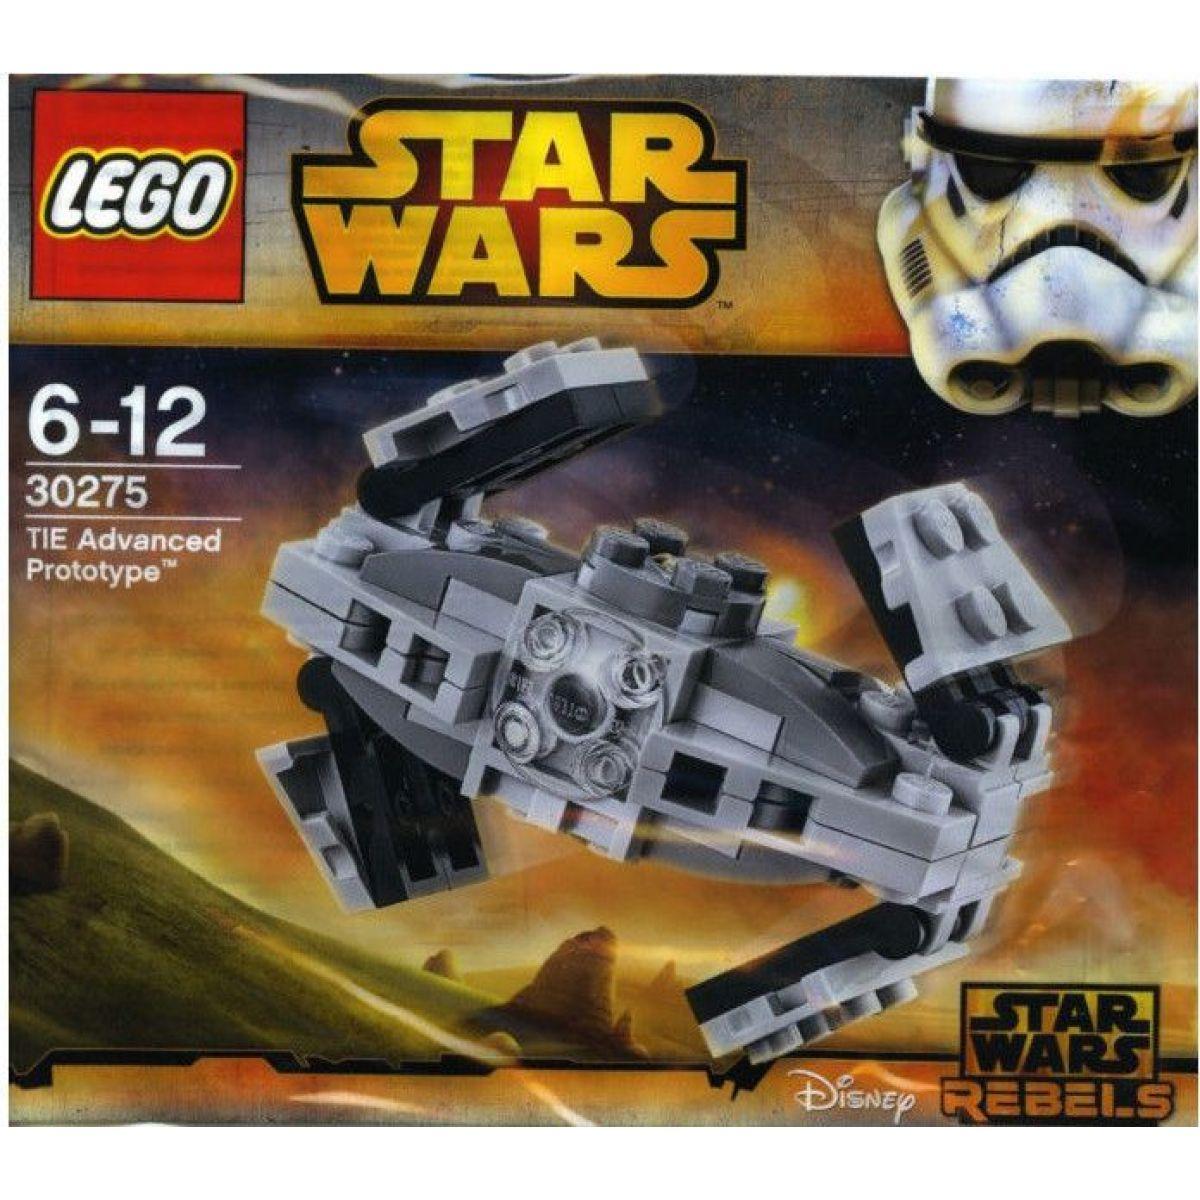 LEGO 30275 Star Wars TIE Advanced Prototype